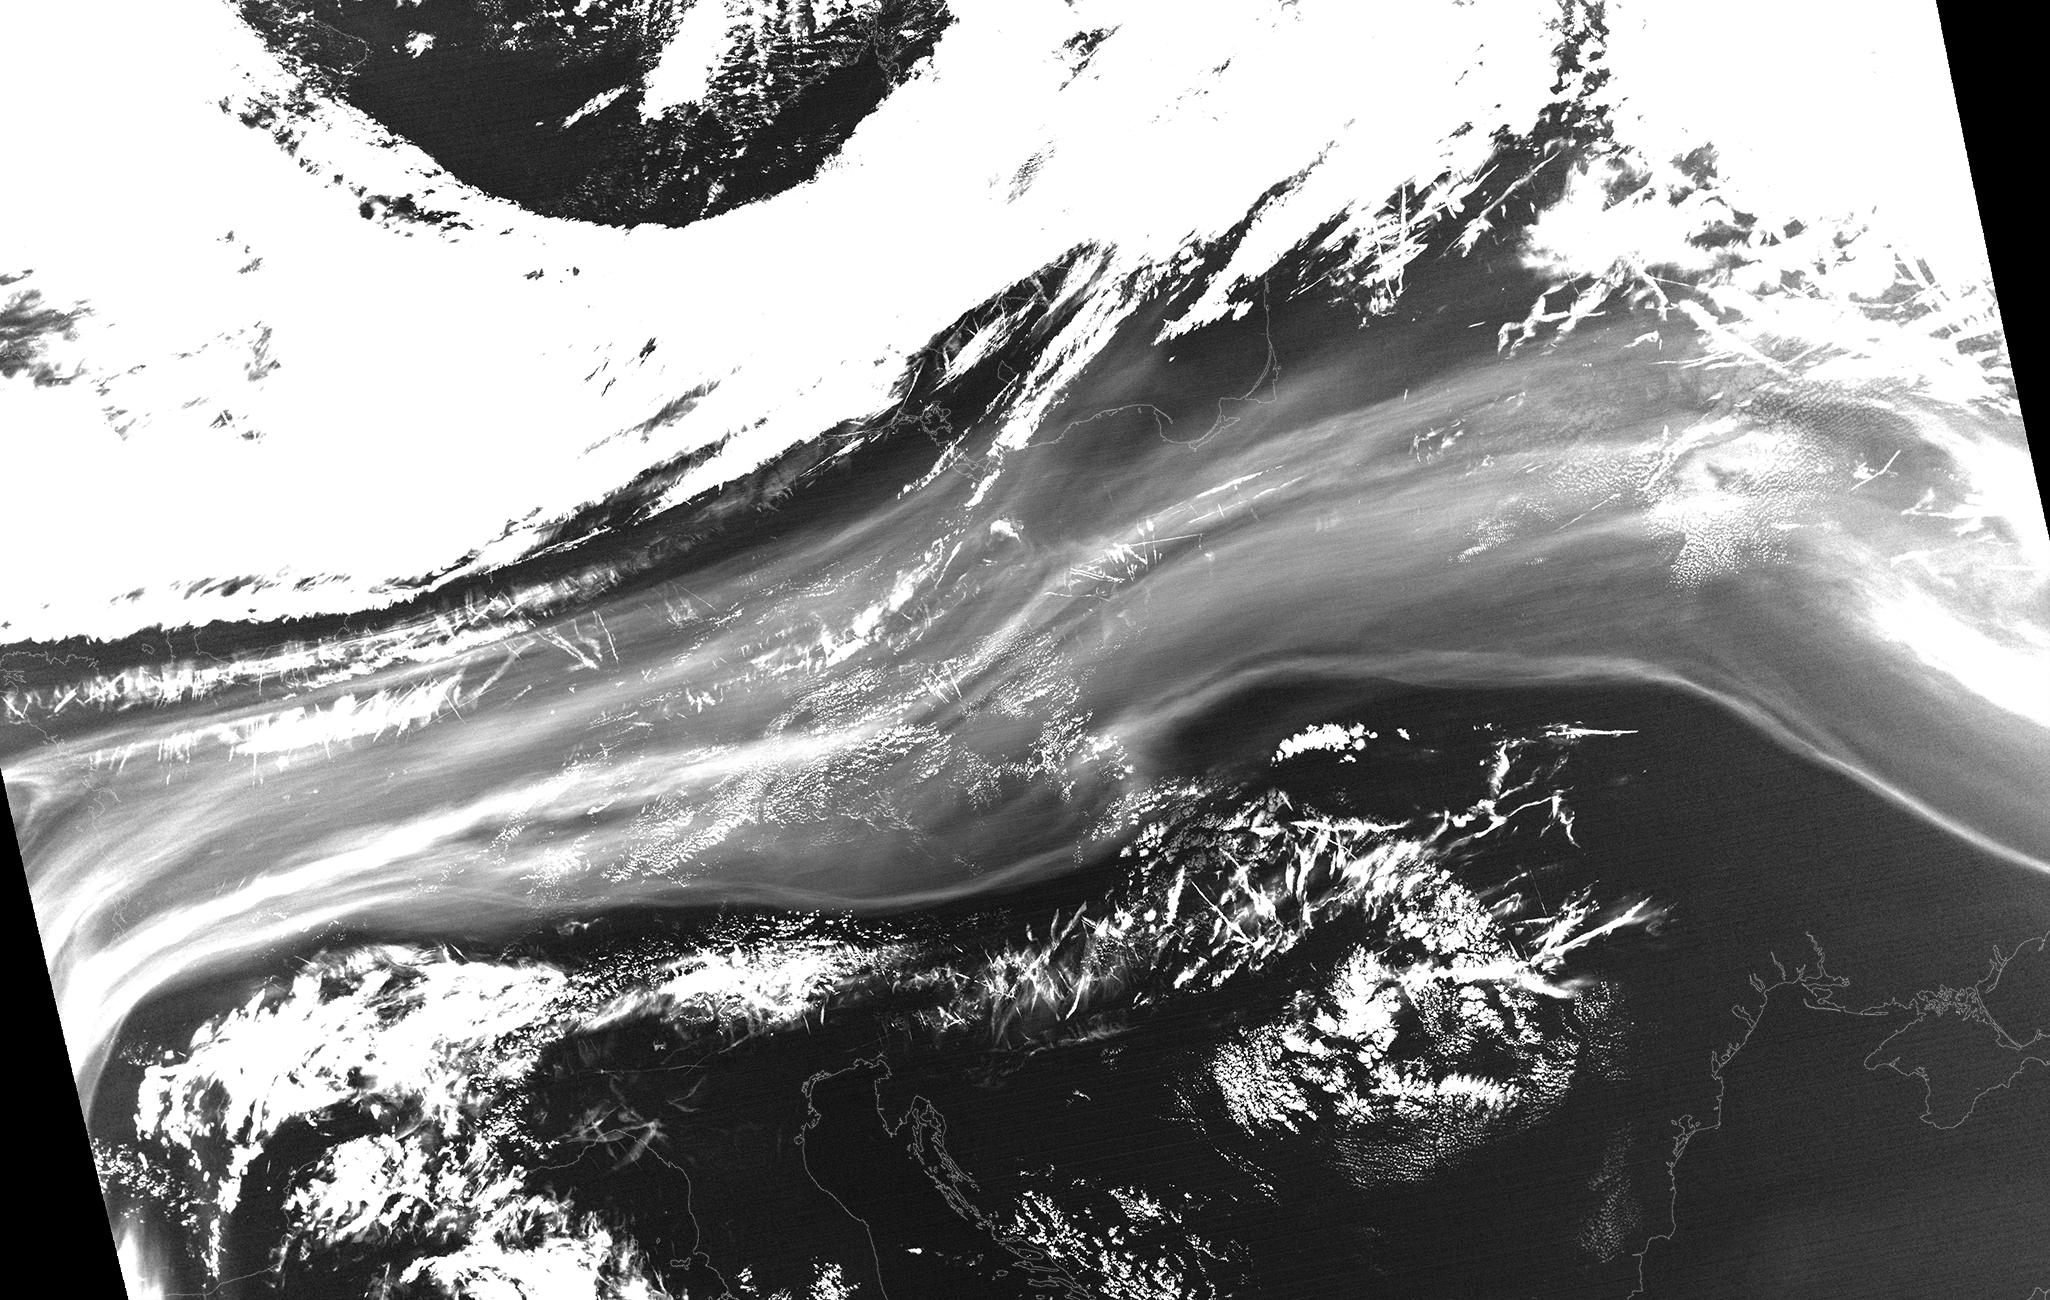 Figure 6: M9 reflectivity range from 0–0.5%